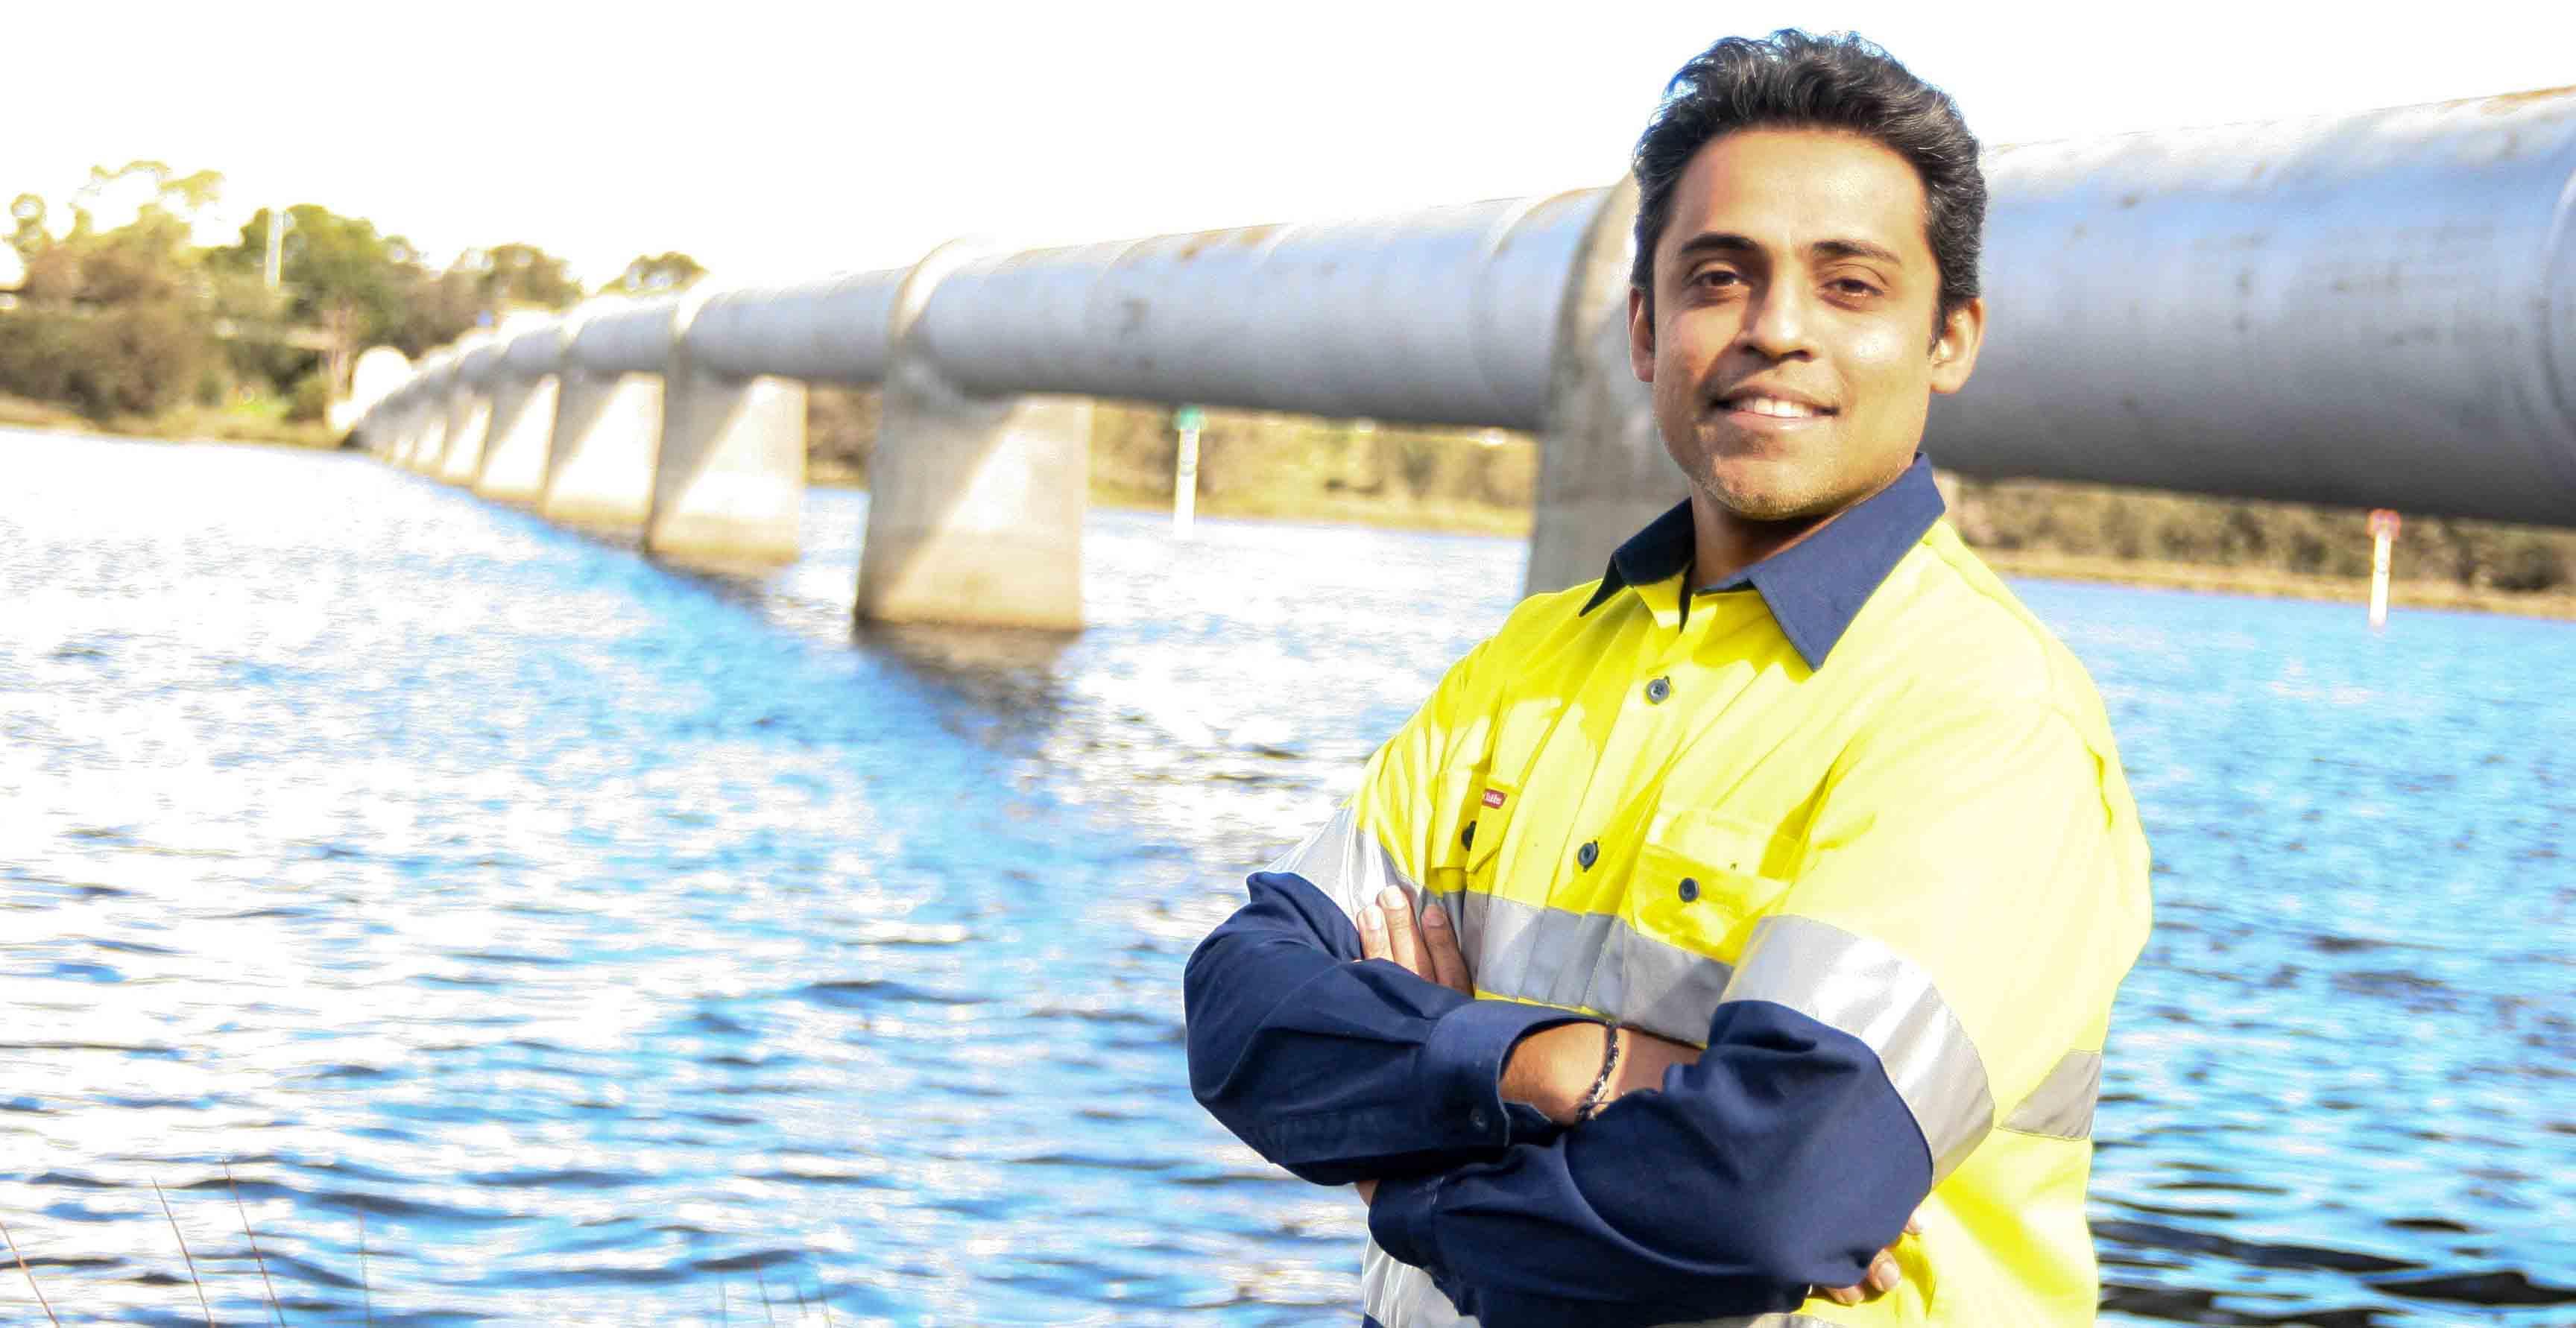 CSIRO senior engineer Dr Rueben Rajasingam